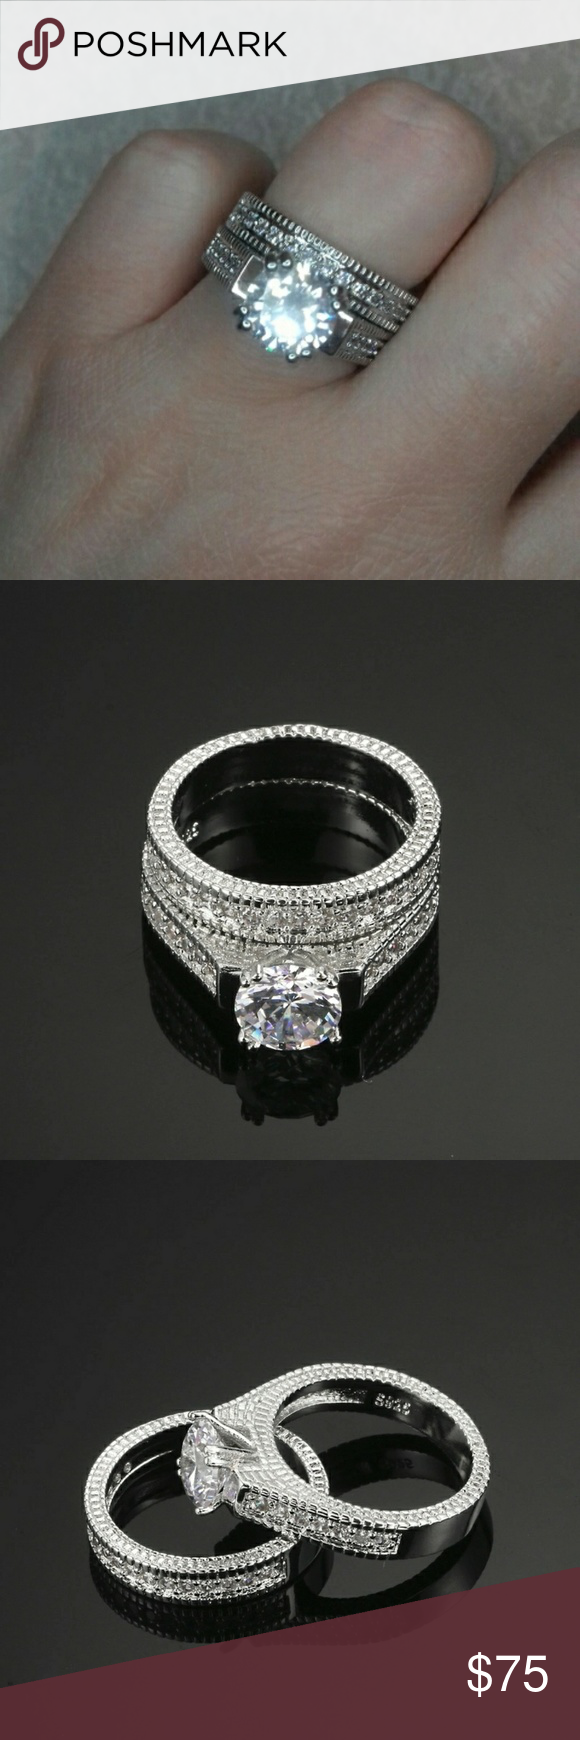 Sterling Silver Big Diamond Wedding Ring Band Set